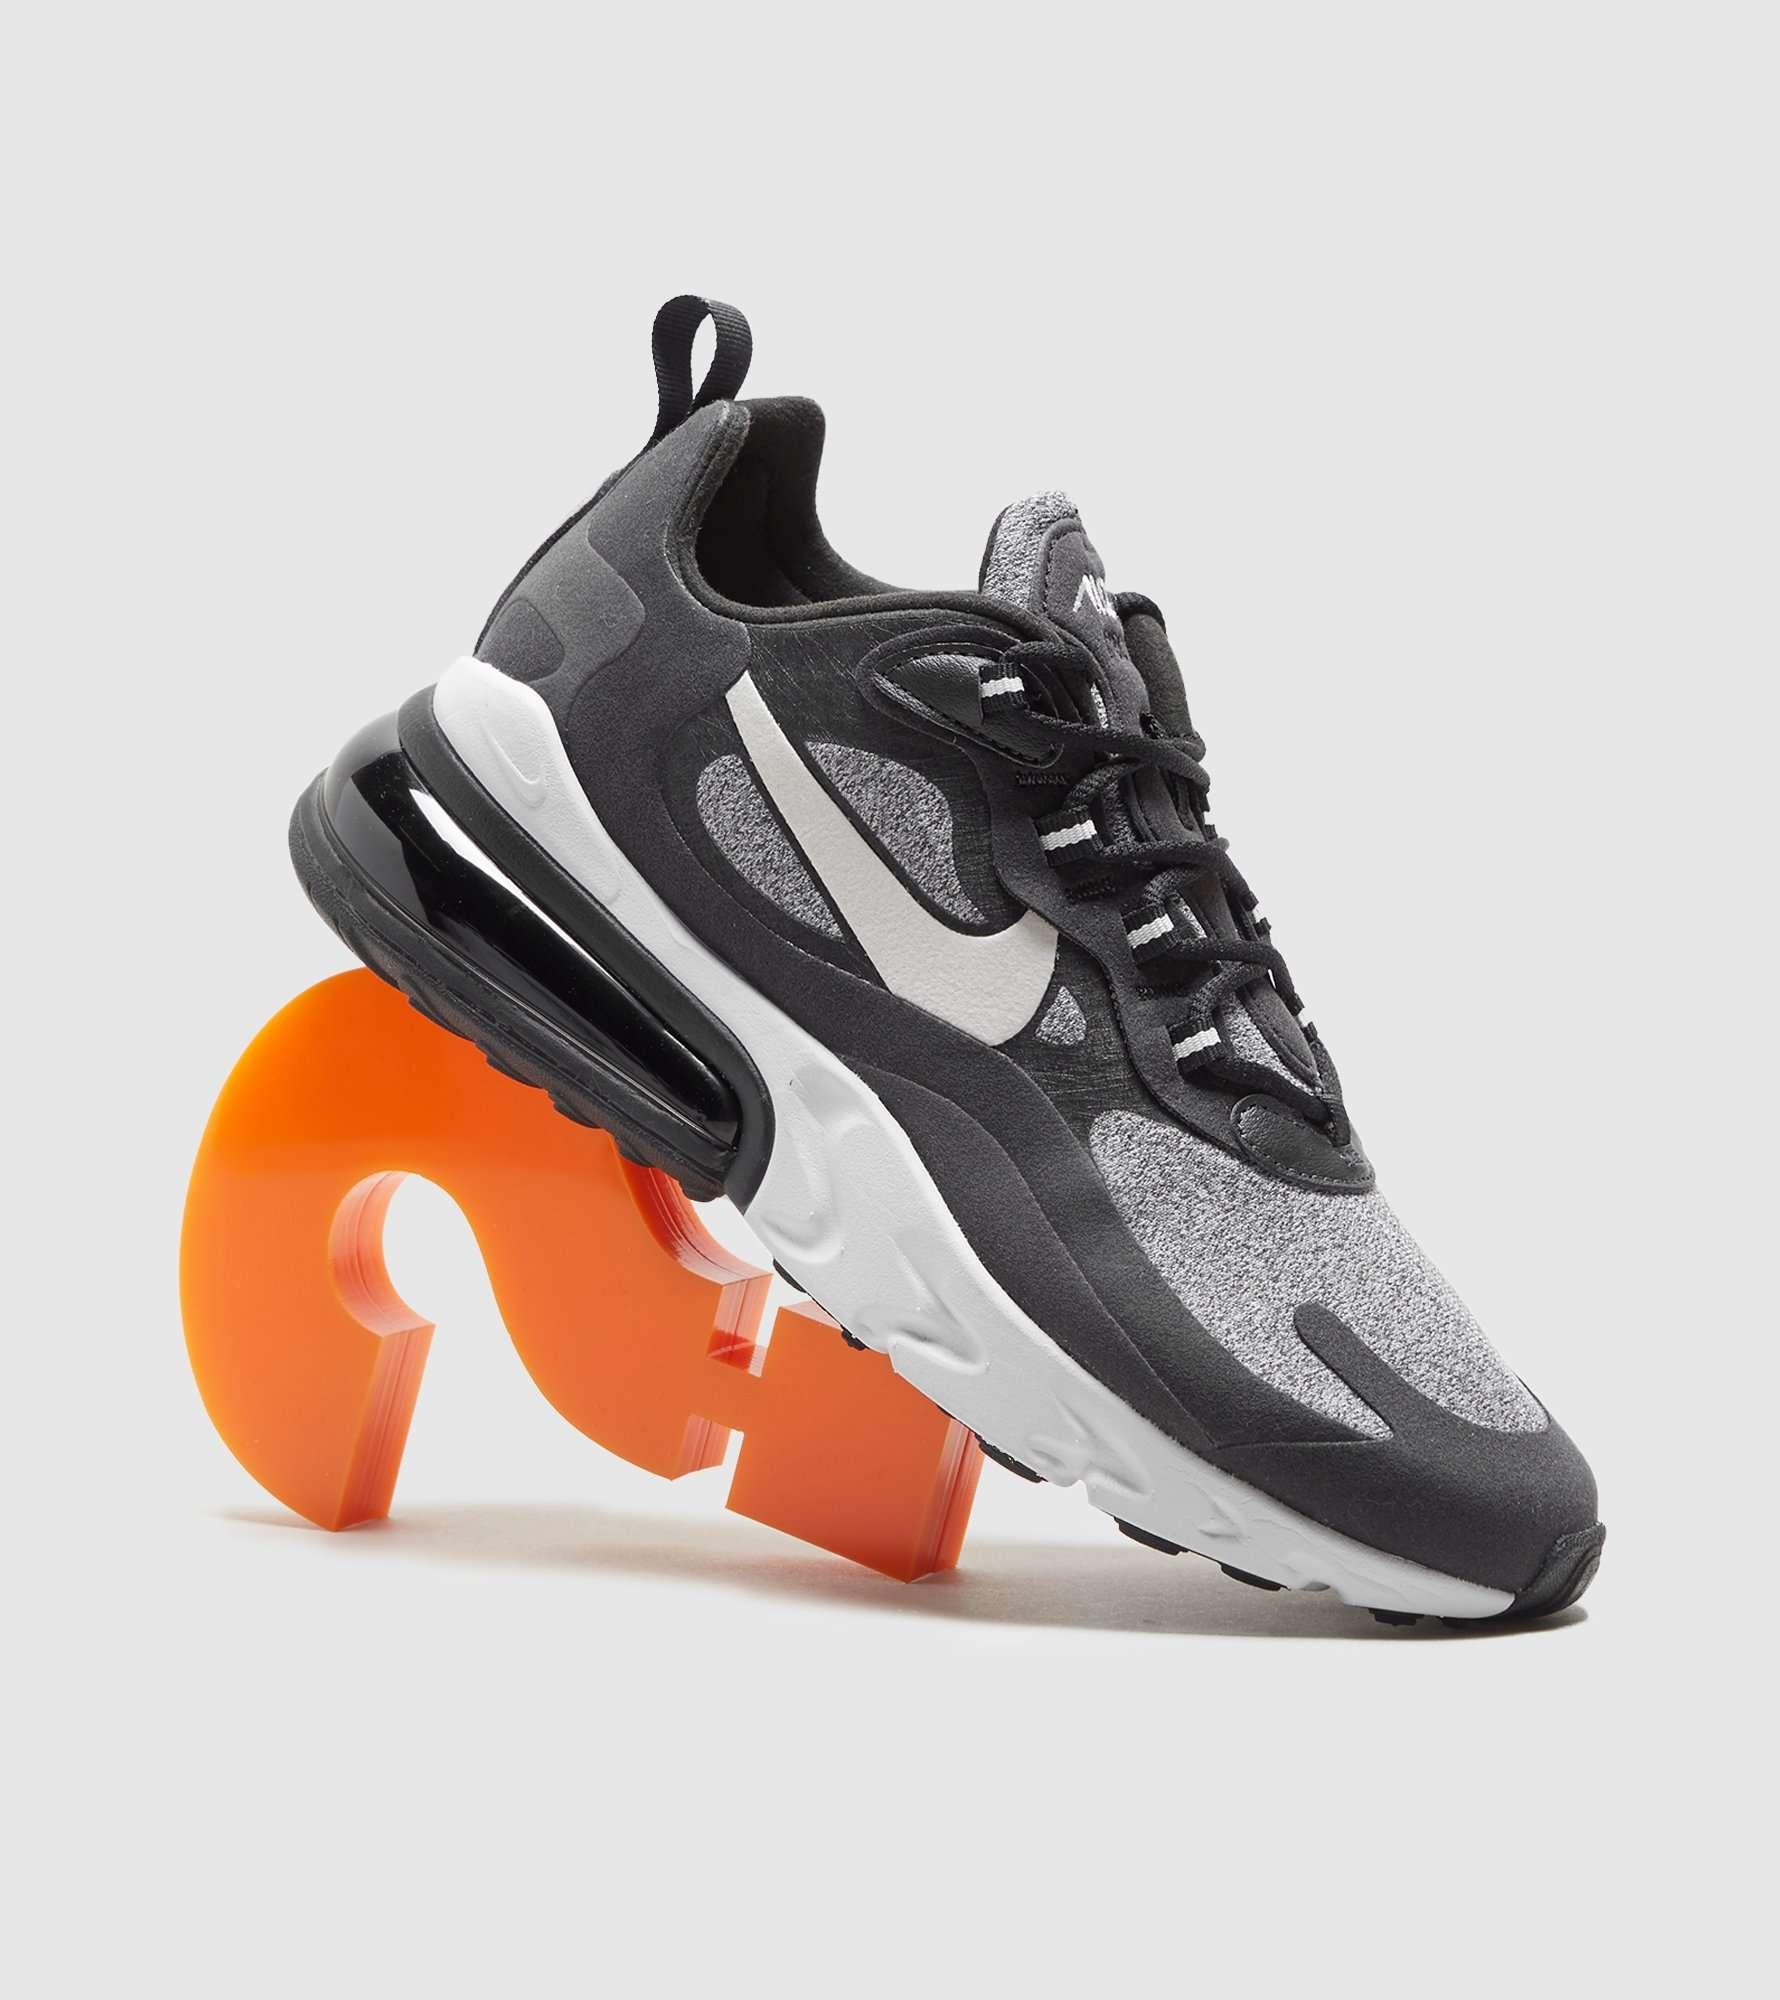 Nike Air Max 270 React Dames | Size?